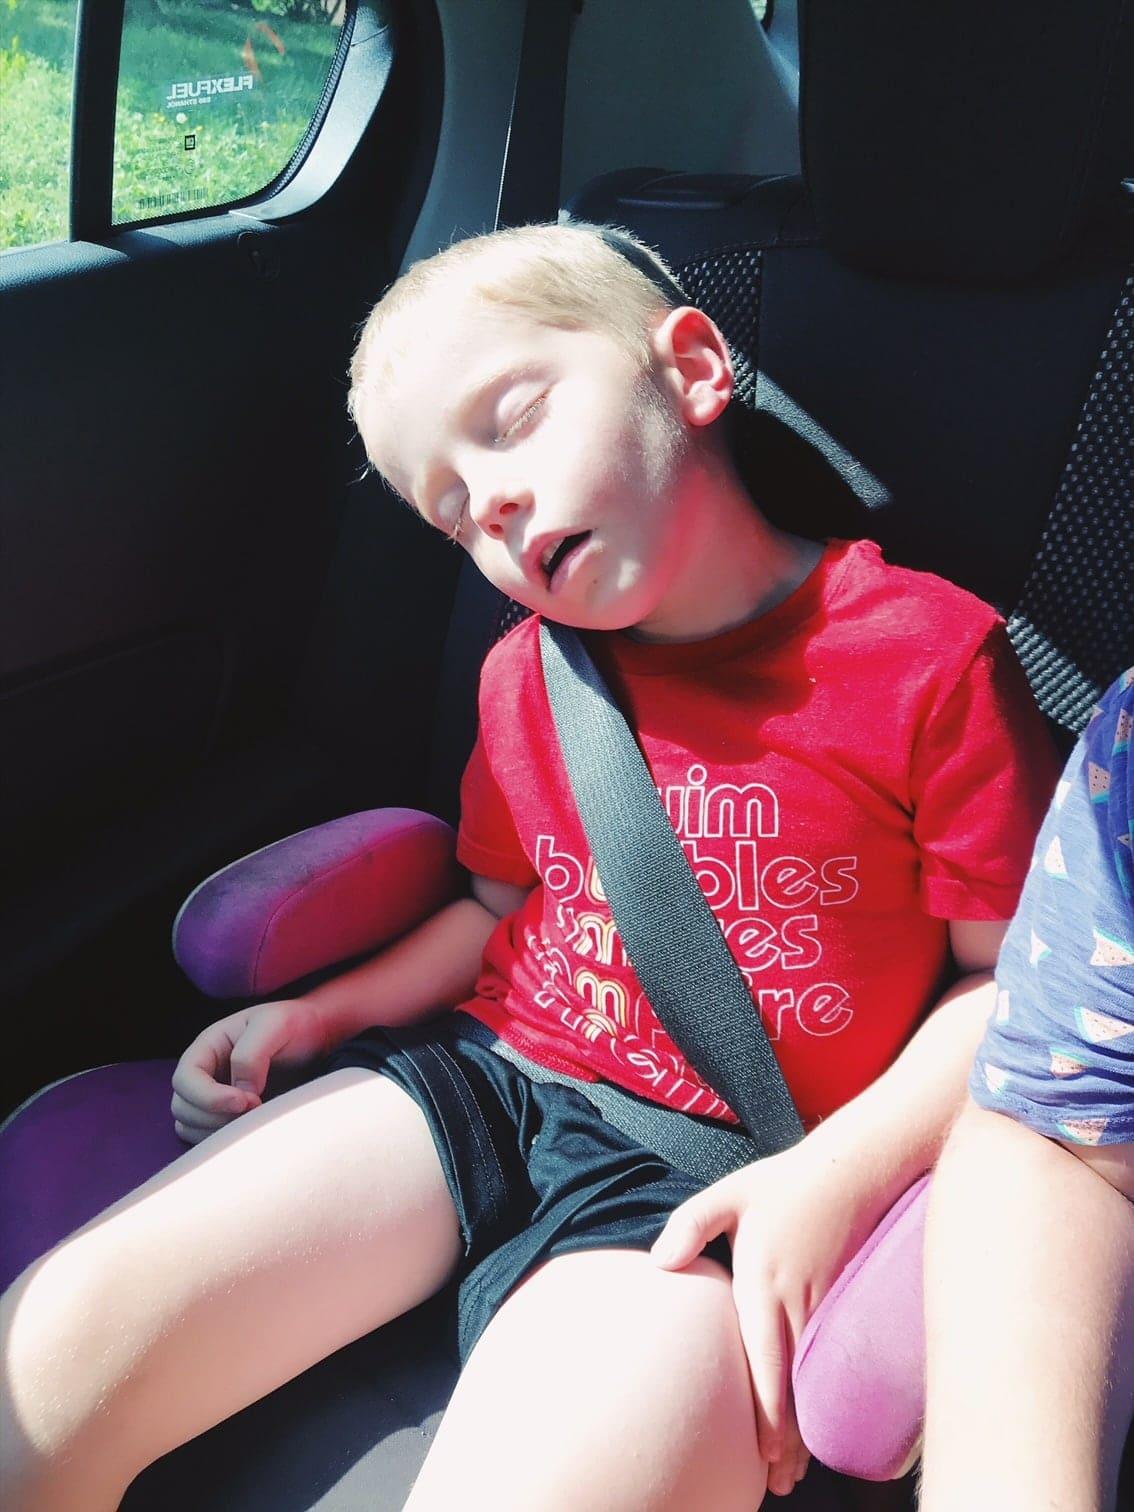 Blake sleeping in his carseat